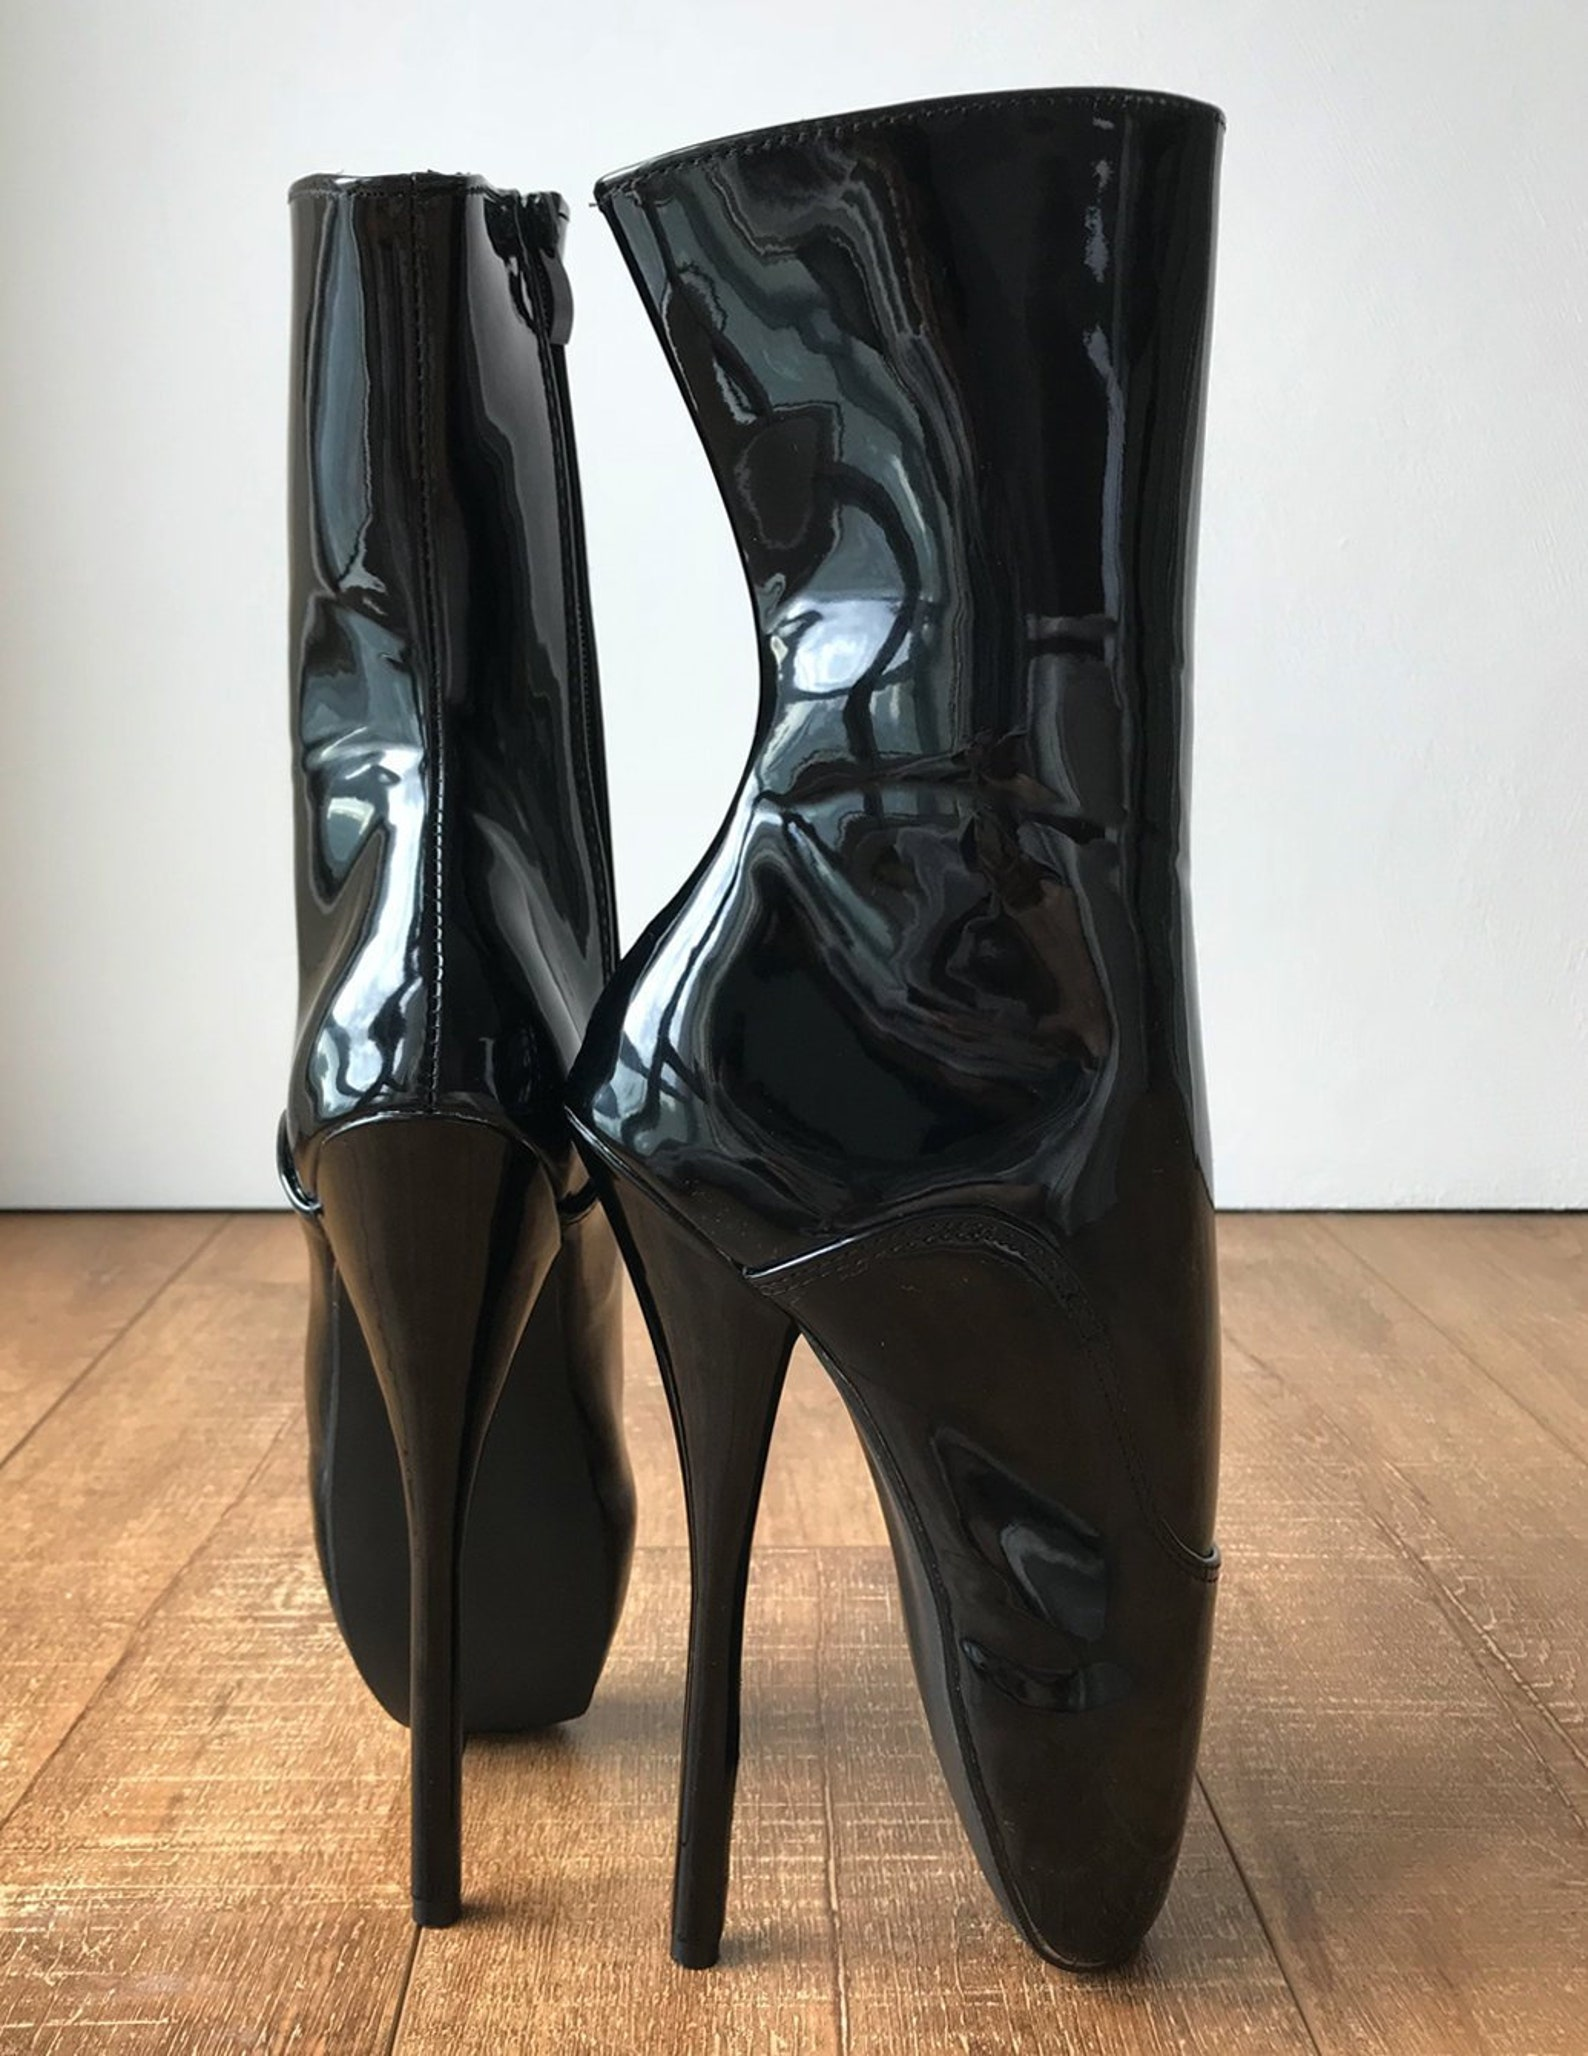 rtbu jean 18cm fetish goth punk slave punk ballet boots patent black